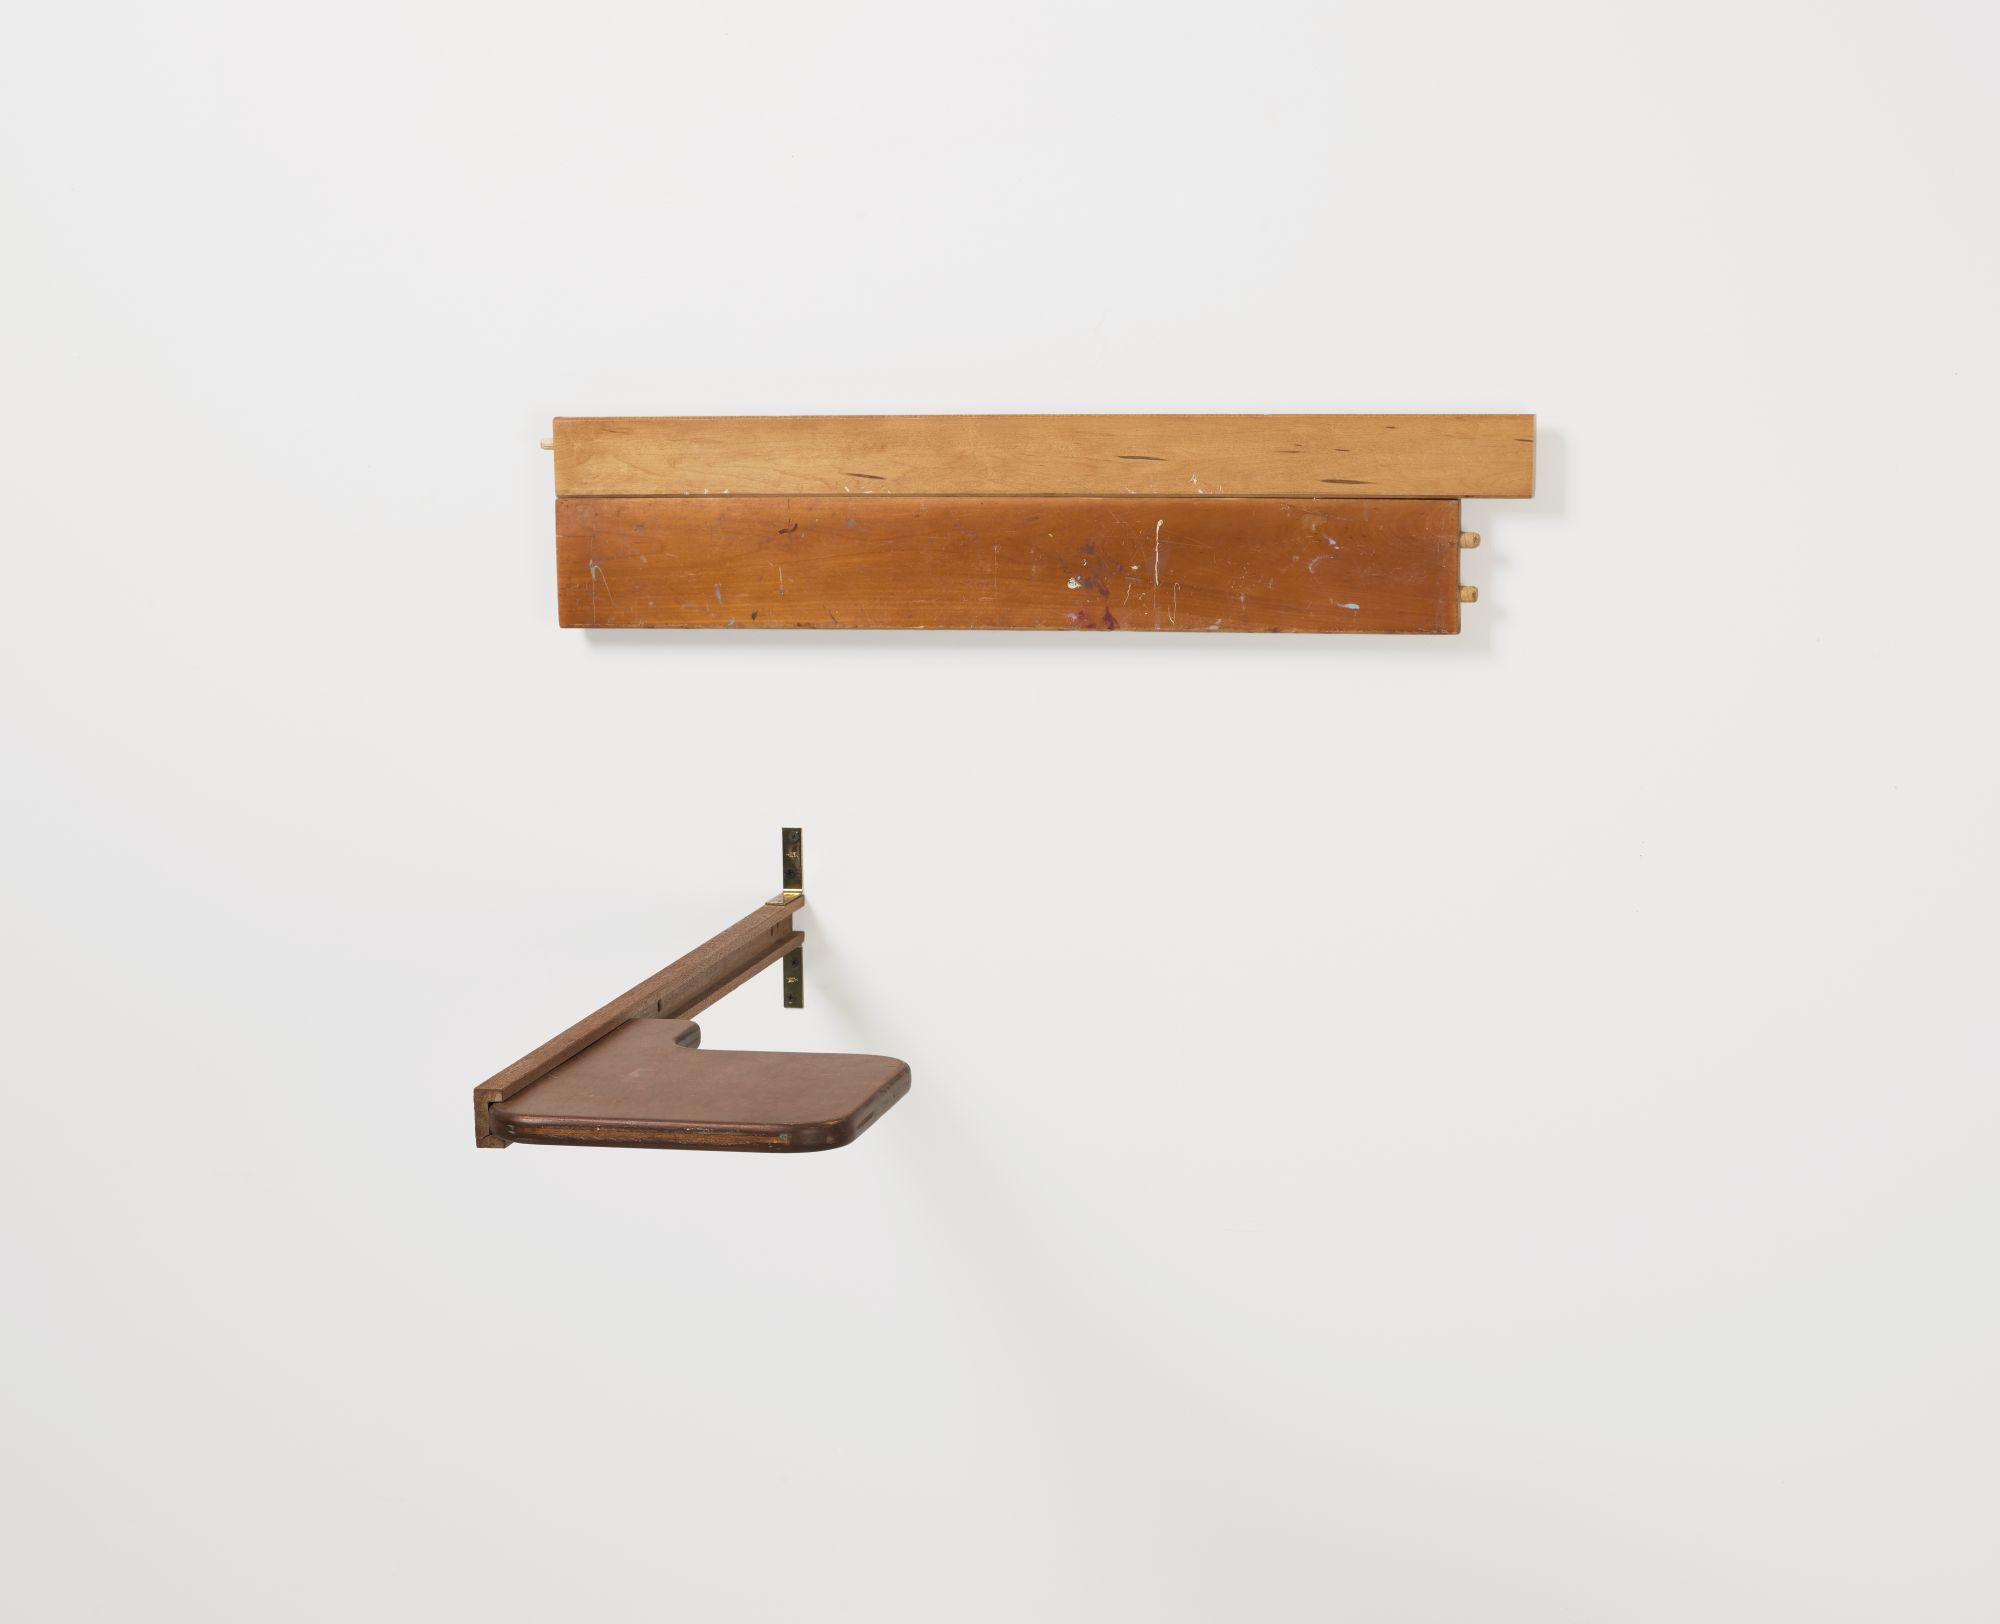 Desk (A Dedication)